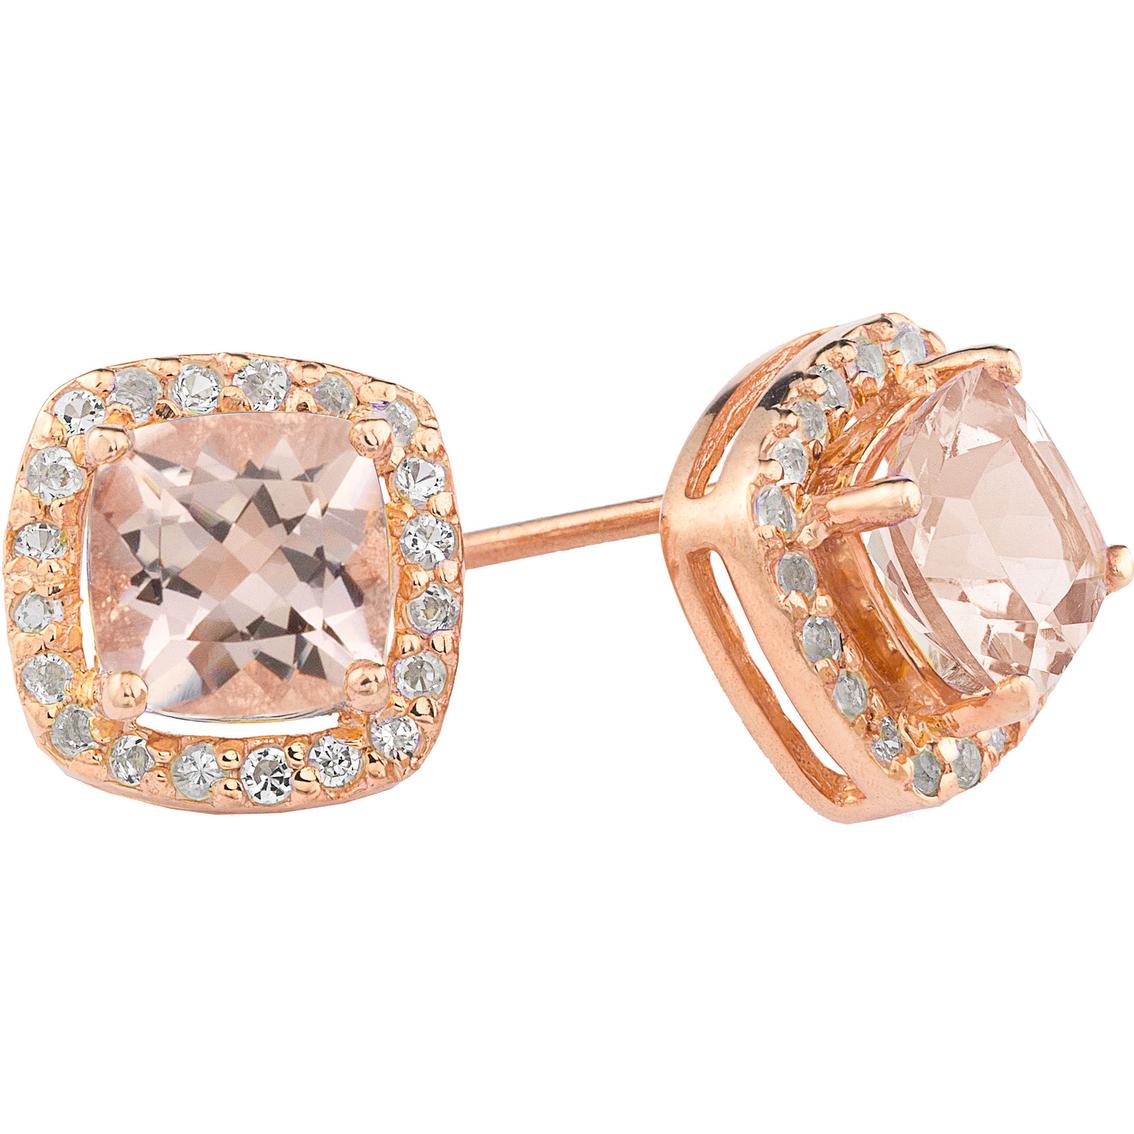 14k Rose Gold Over Sterling Silver Morganite Cushion Earrings